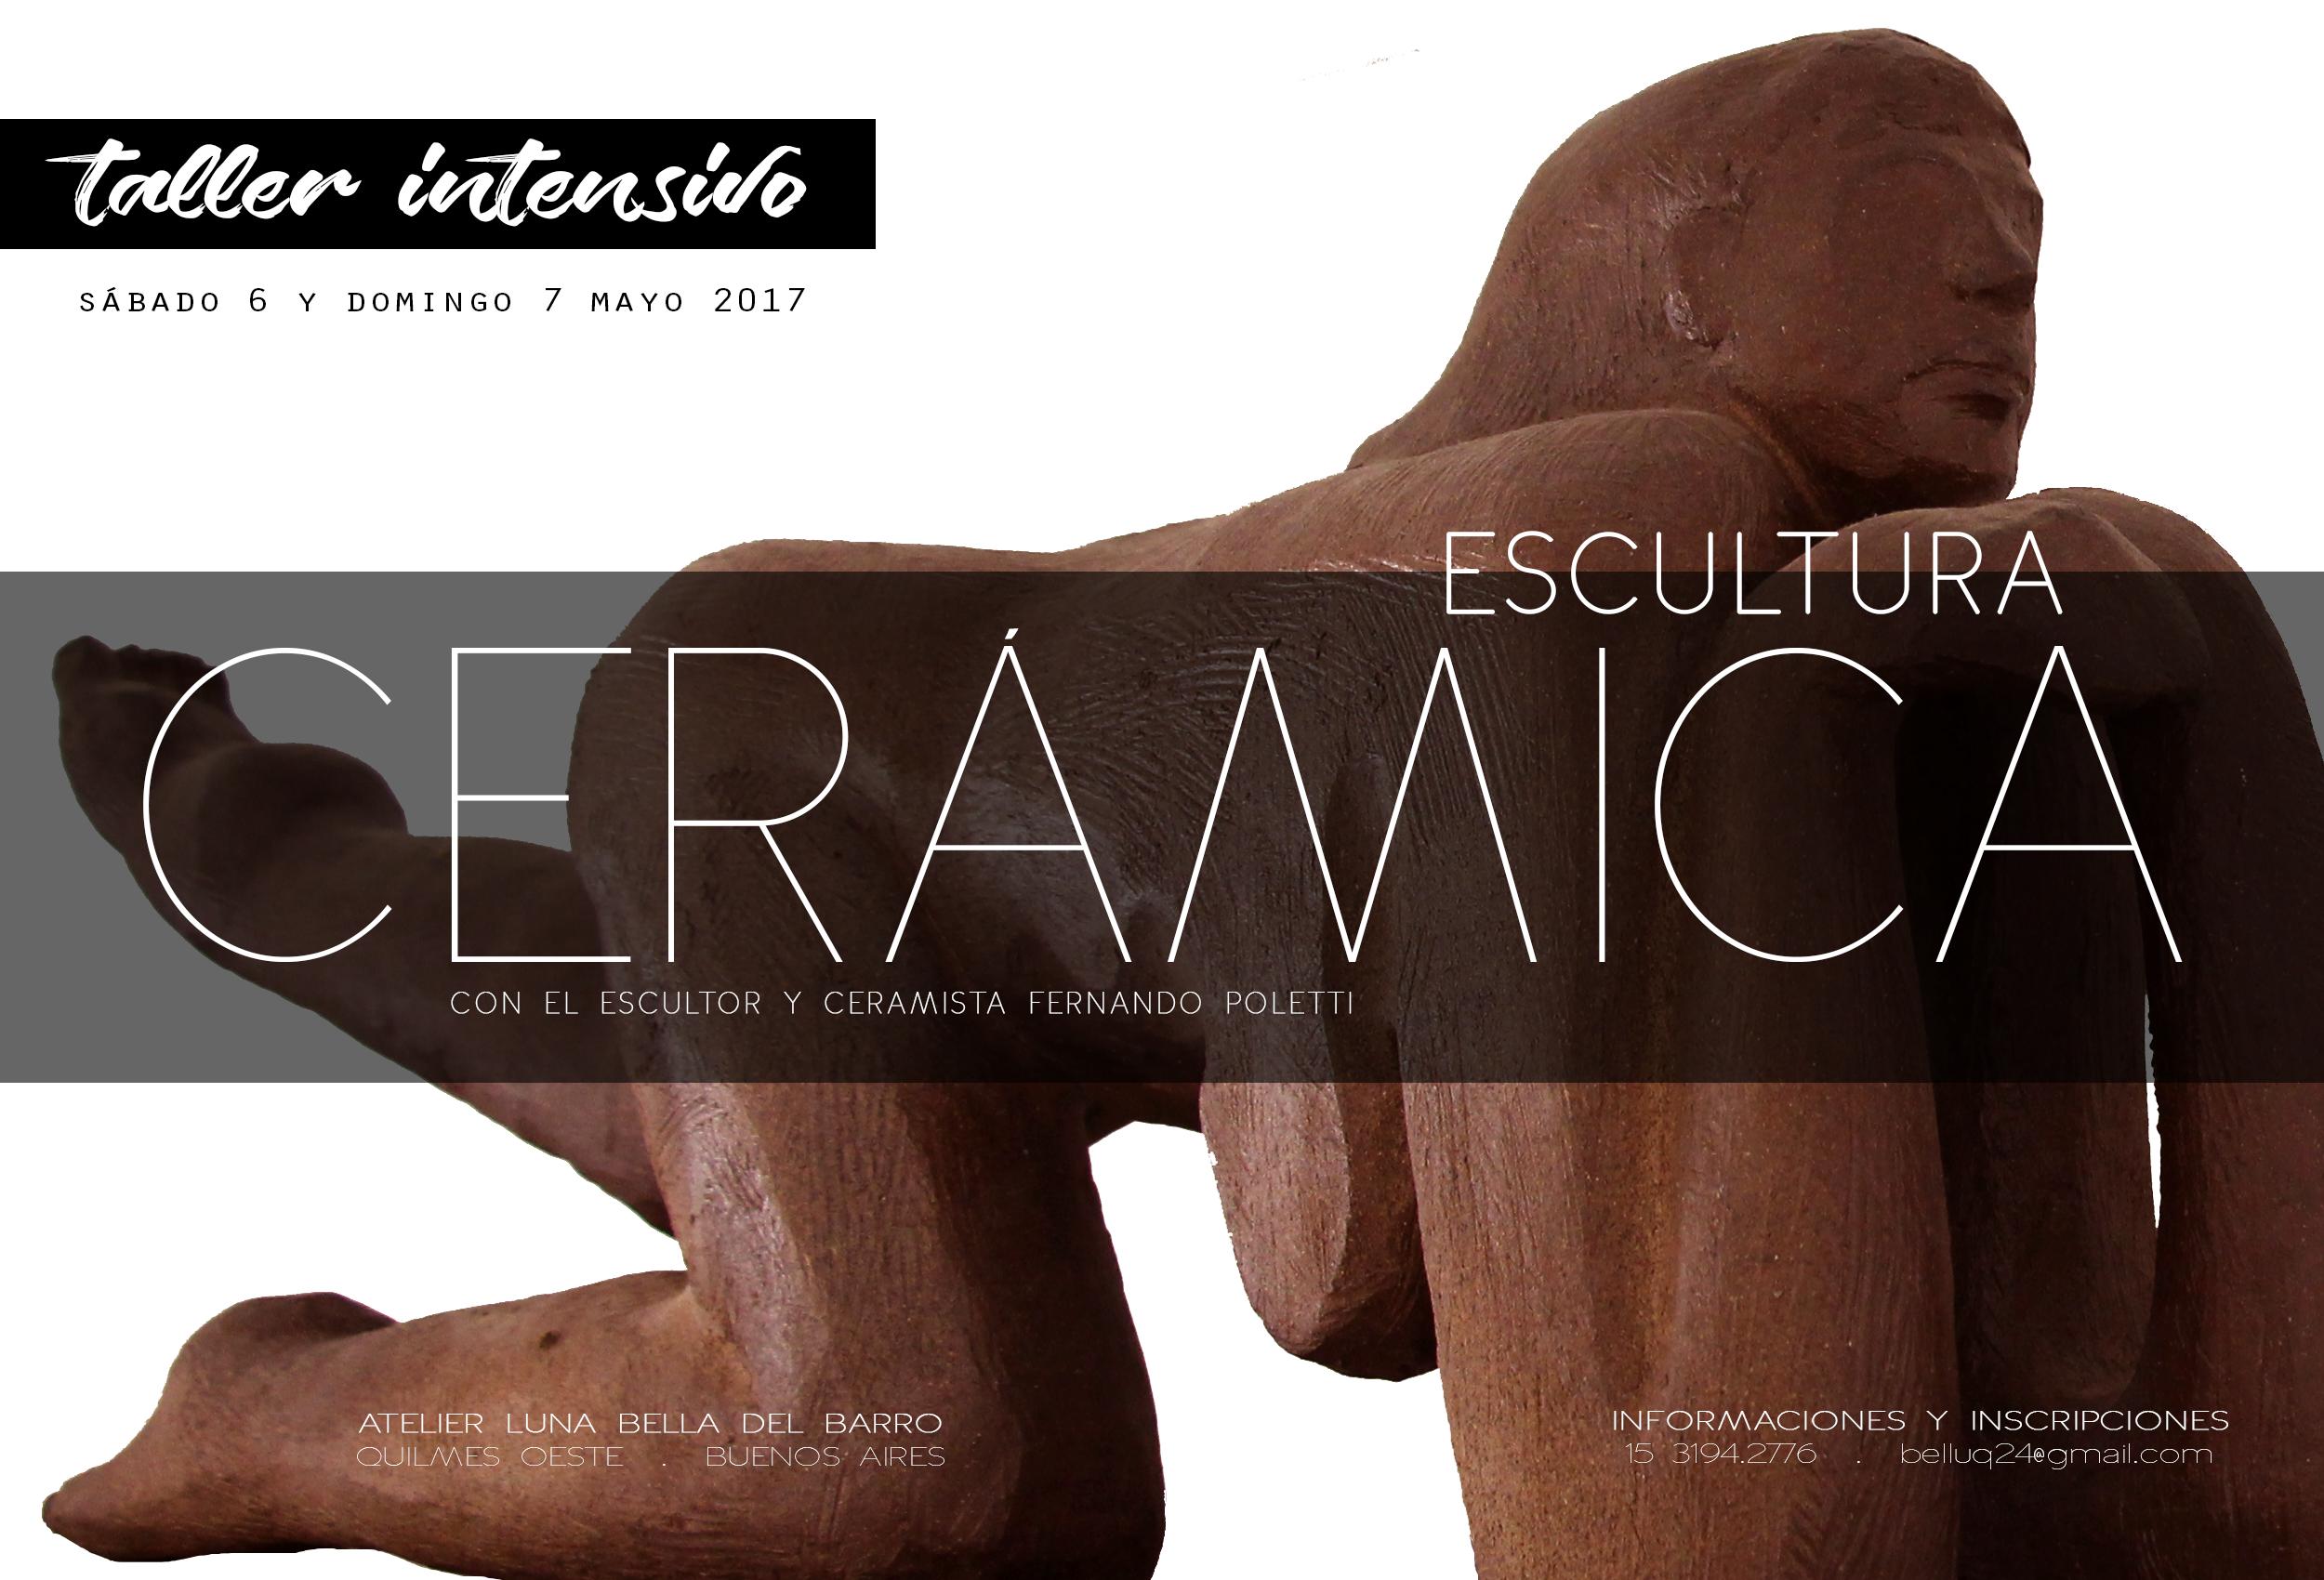 2017 . CURSO INTENSIVO . escultura cerâmica . BUENOS AIRES